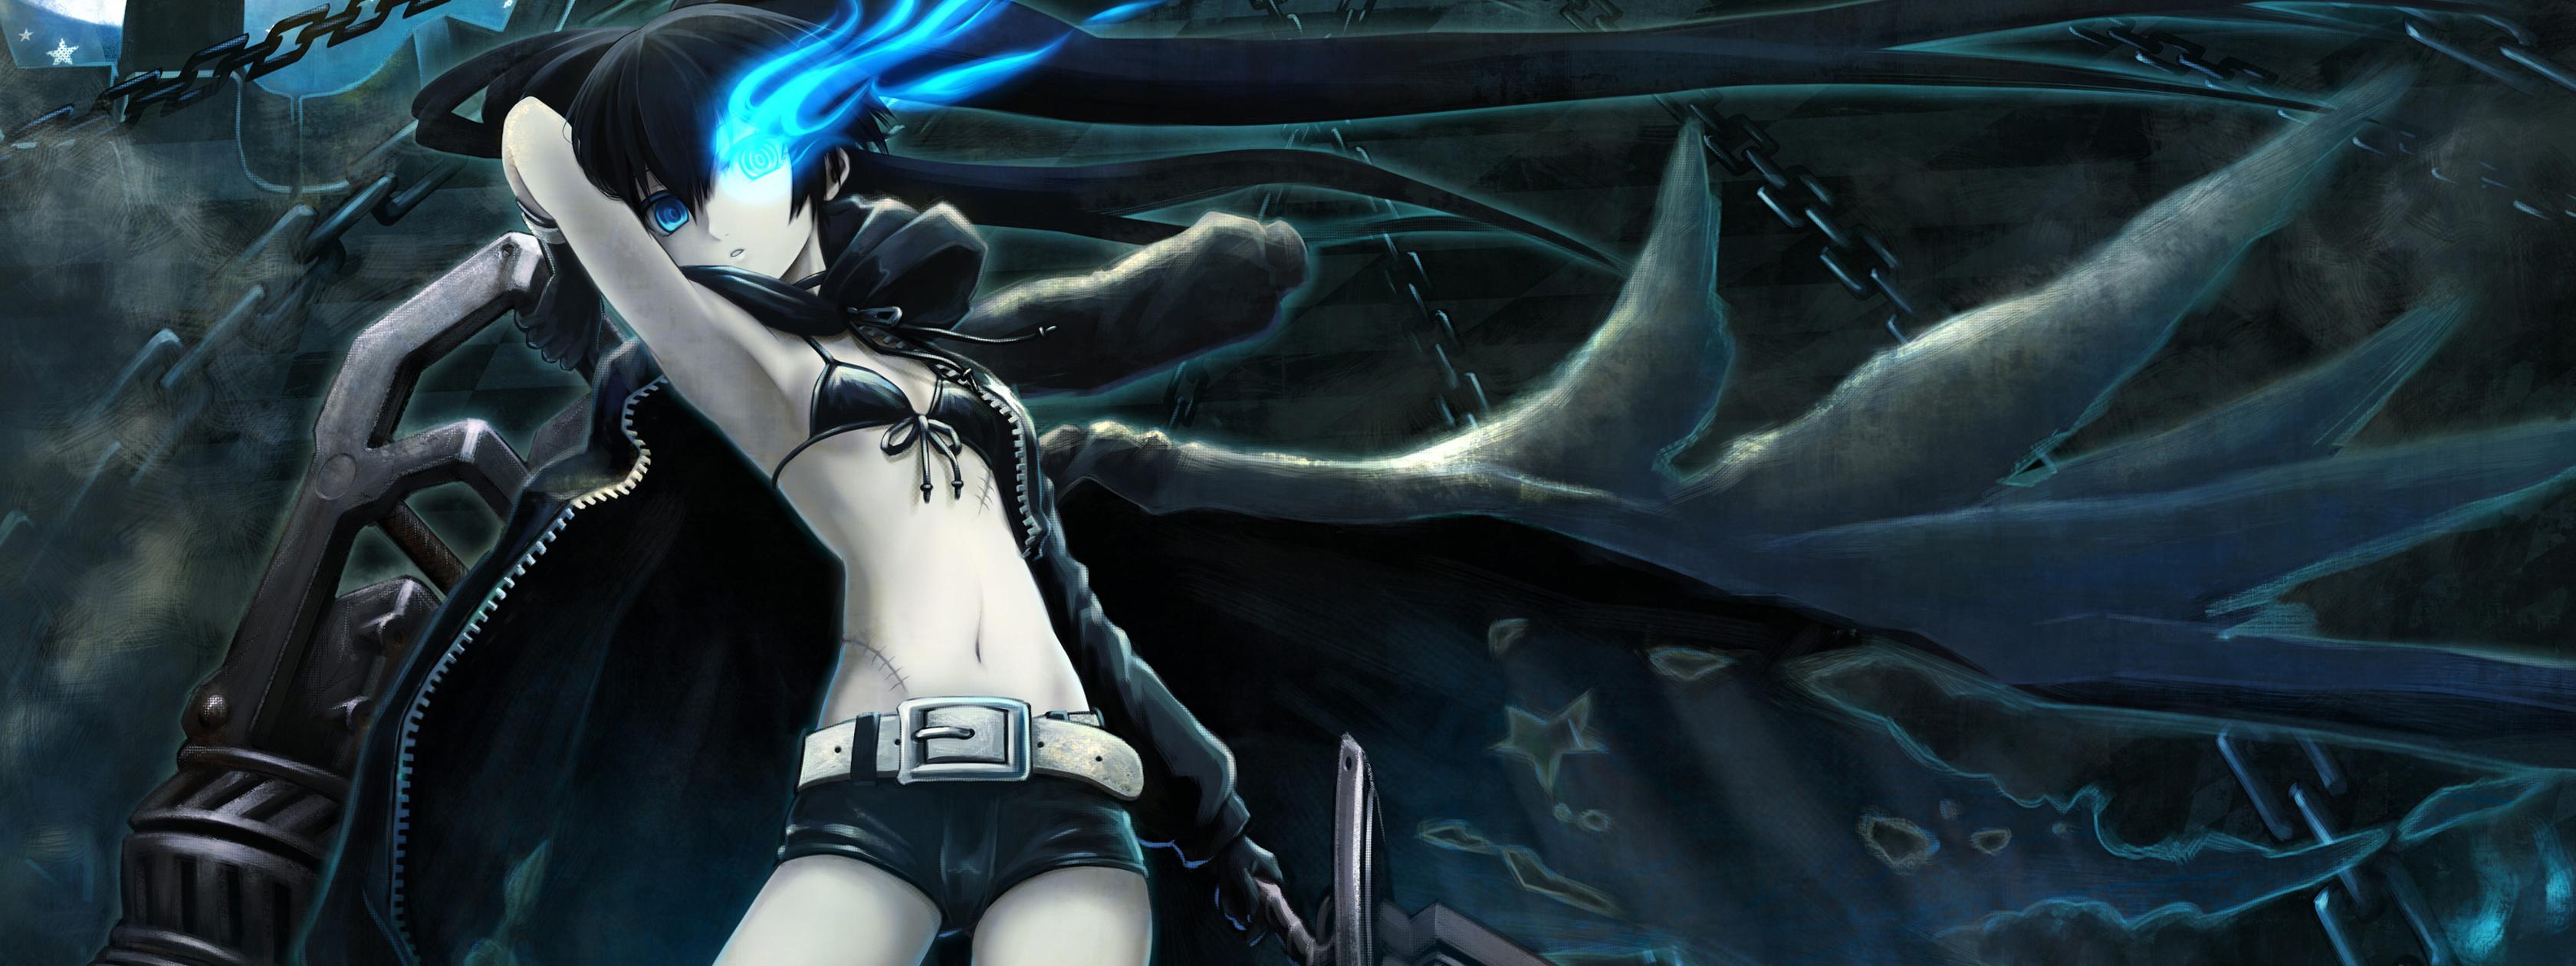 Black Rock Shooter Hd Wallpaper Hd Anime Dual Monitor 916433